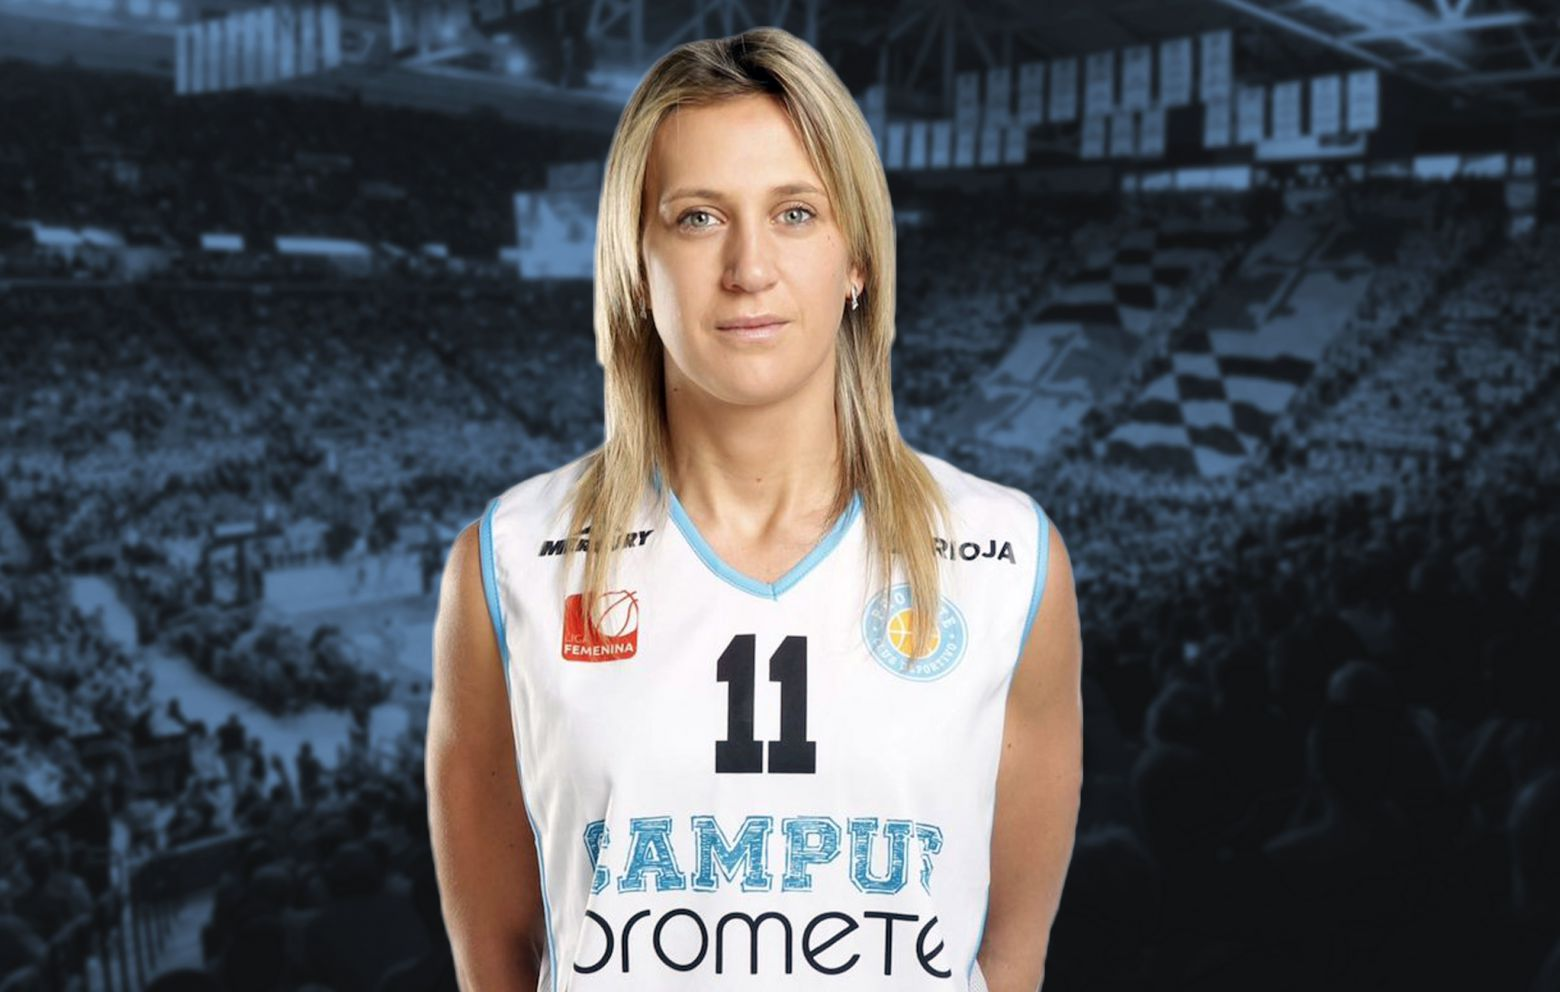 ADRIJANA KNEZEVIC has re-signed with Campus Promete